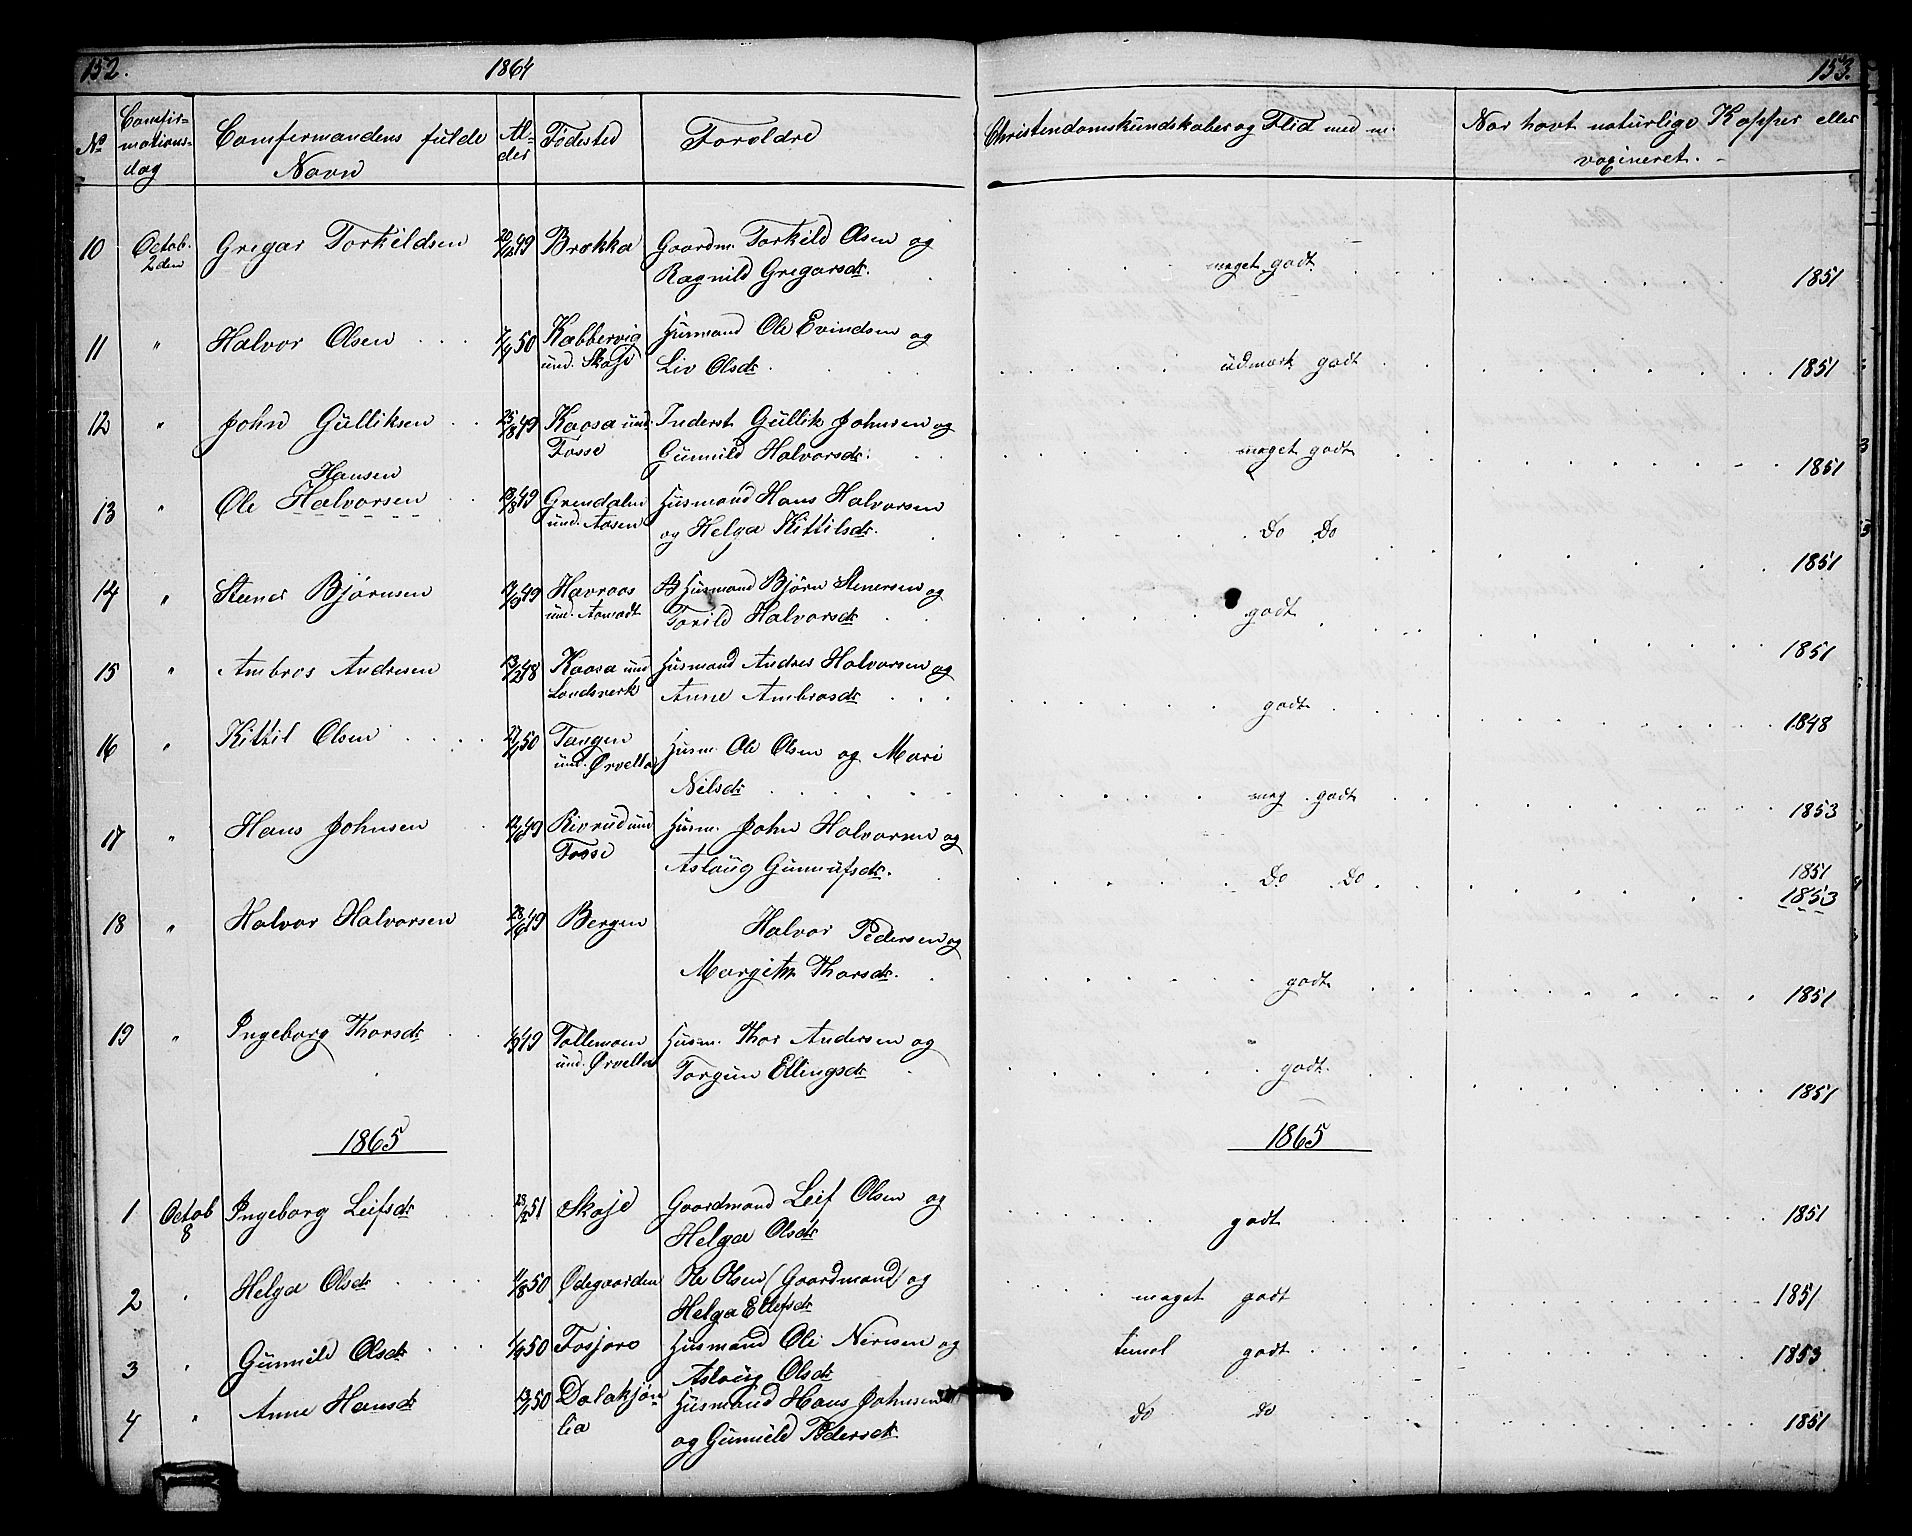 SAKO, Hjartdal kirkebøker, G/Gb/L0002: Klokkerbok nr. II 2, 1854-1884, s. 152-153